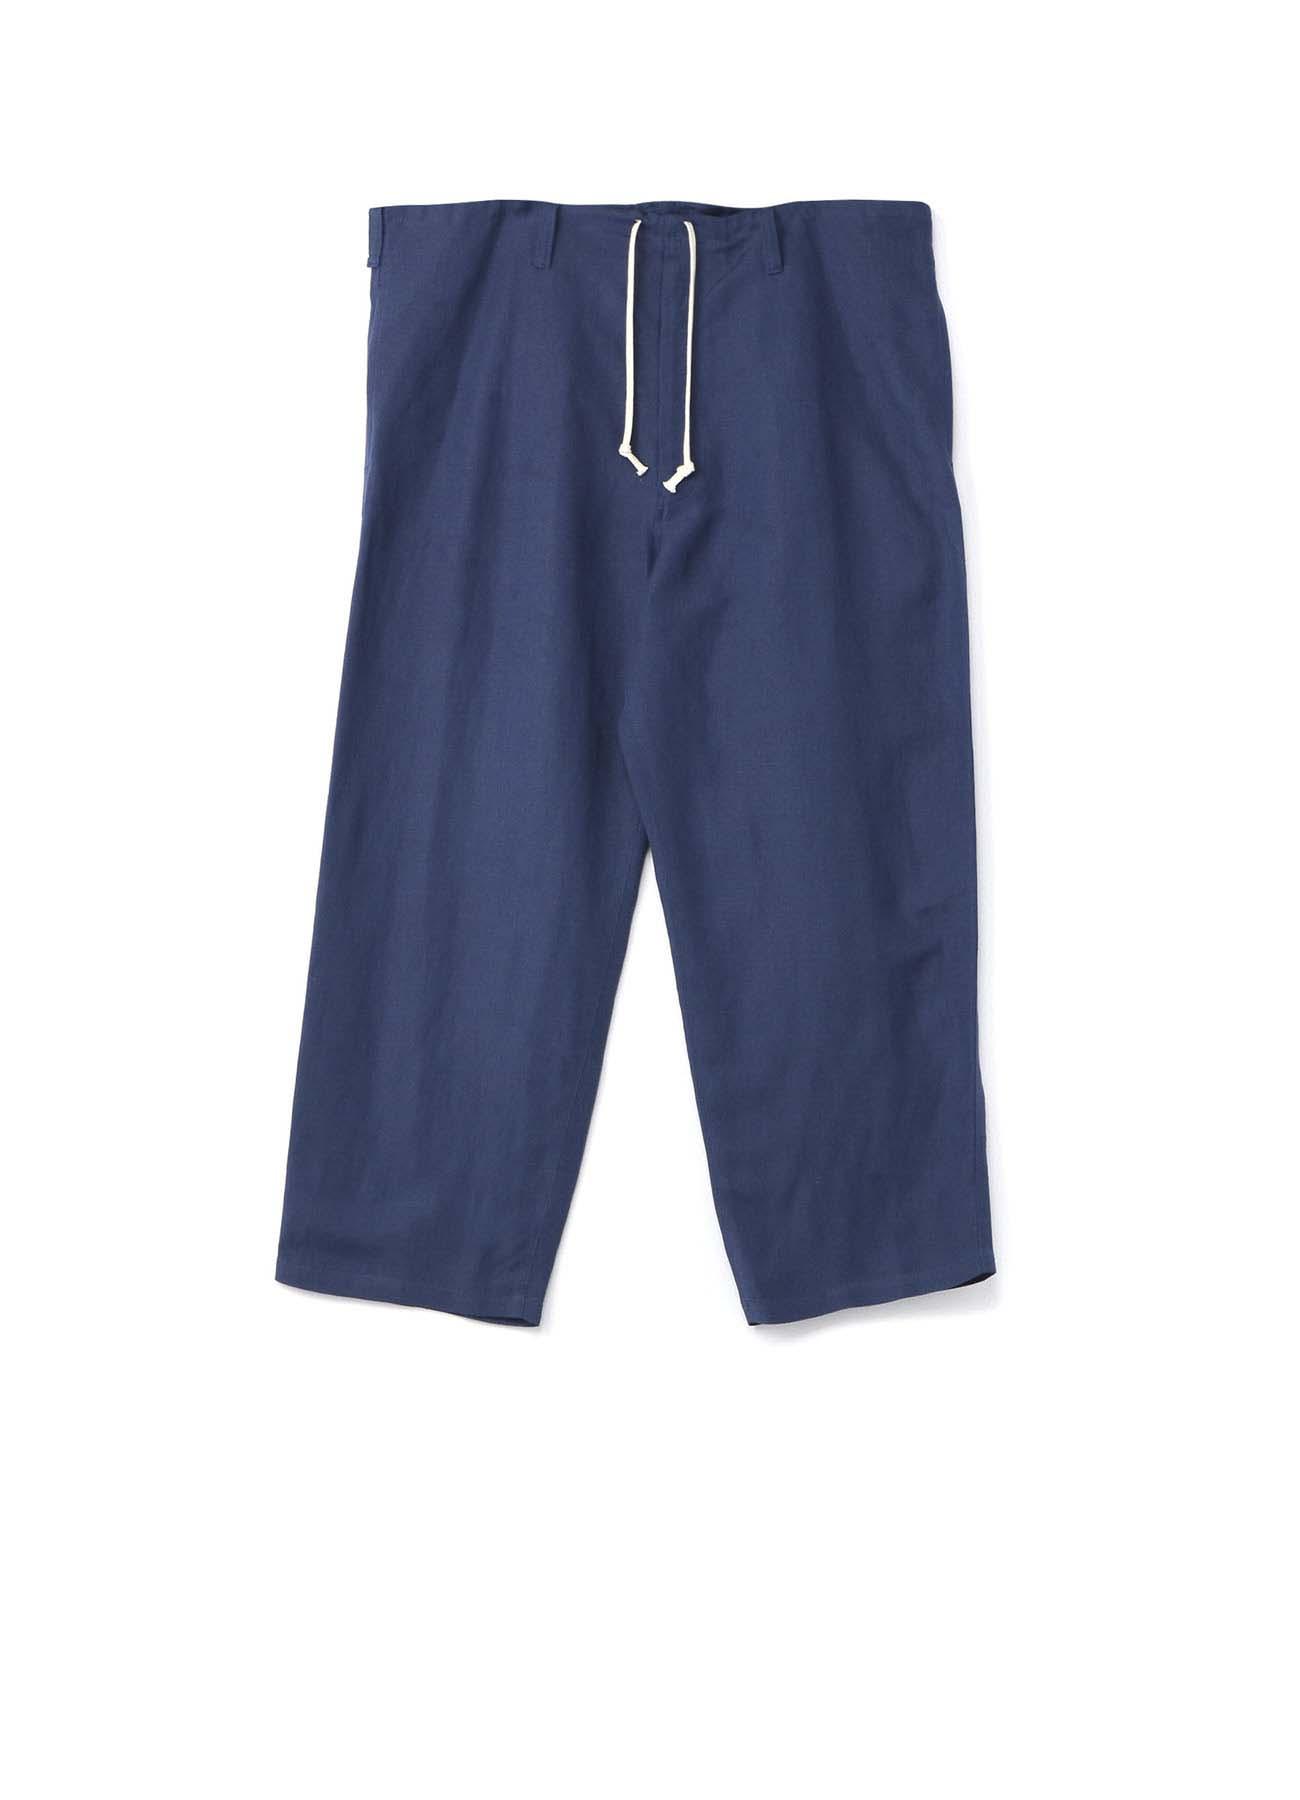 Rayon Linen Easy Cross West Cord Pants